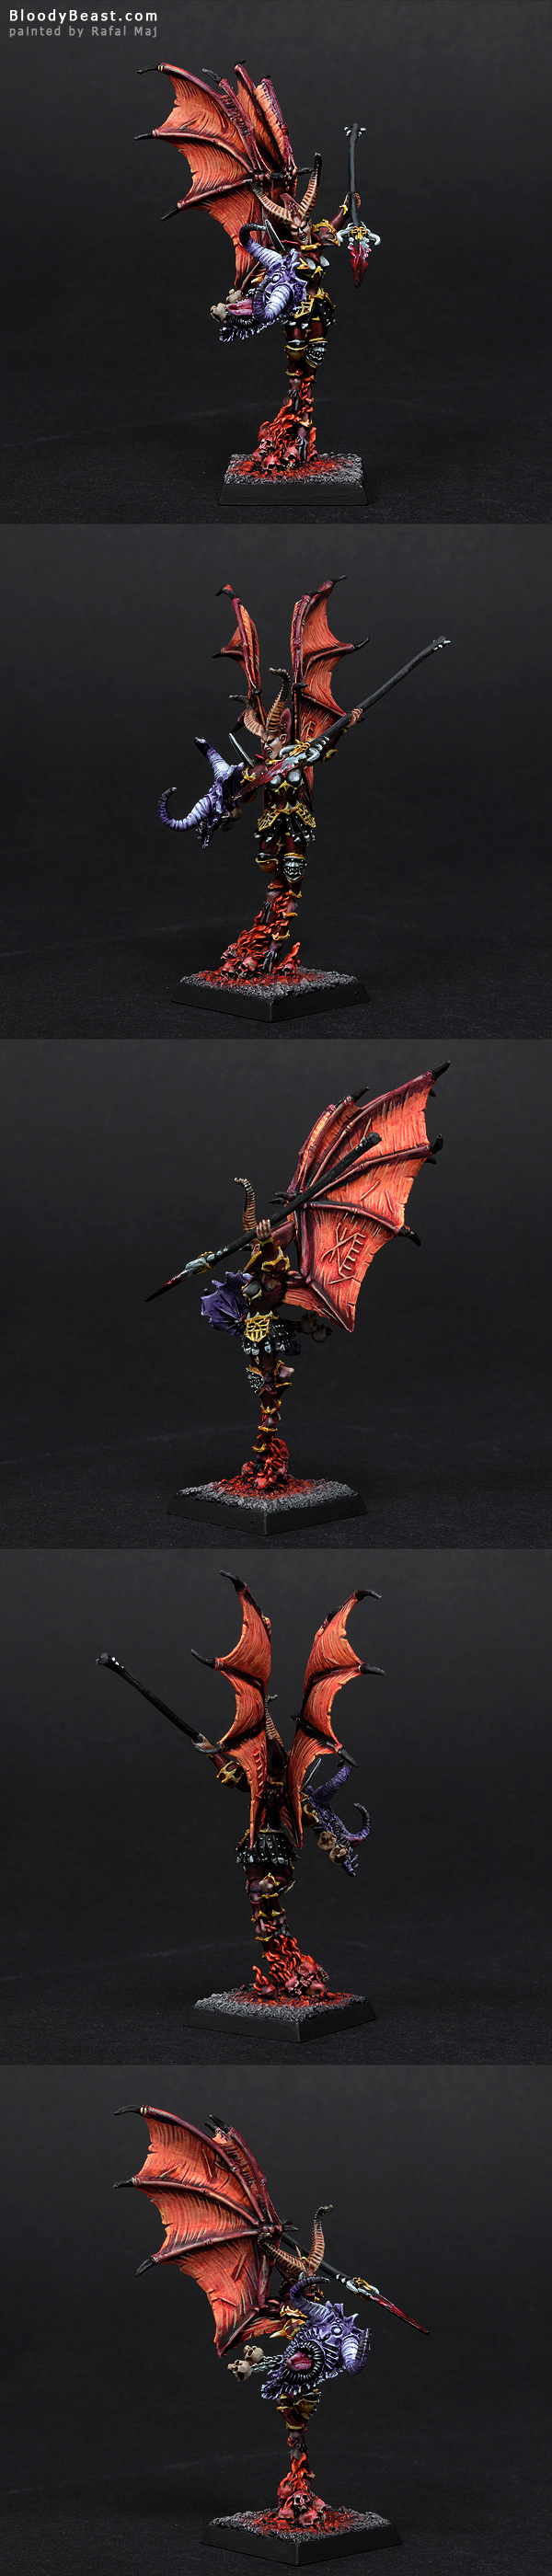 Valkia the Bloody painted by Rafal Maj (BloodyBeast.com)